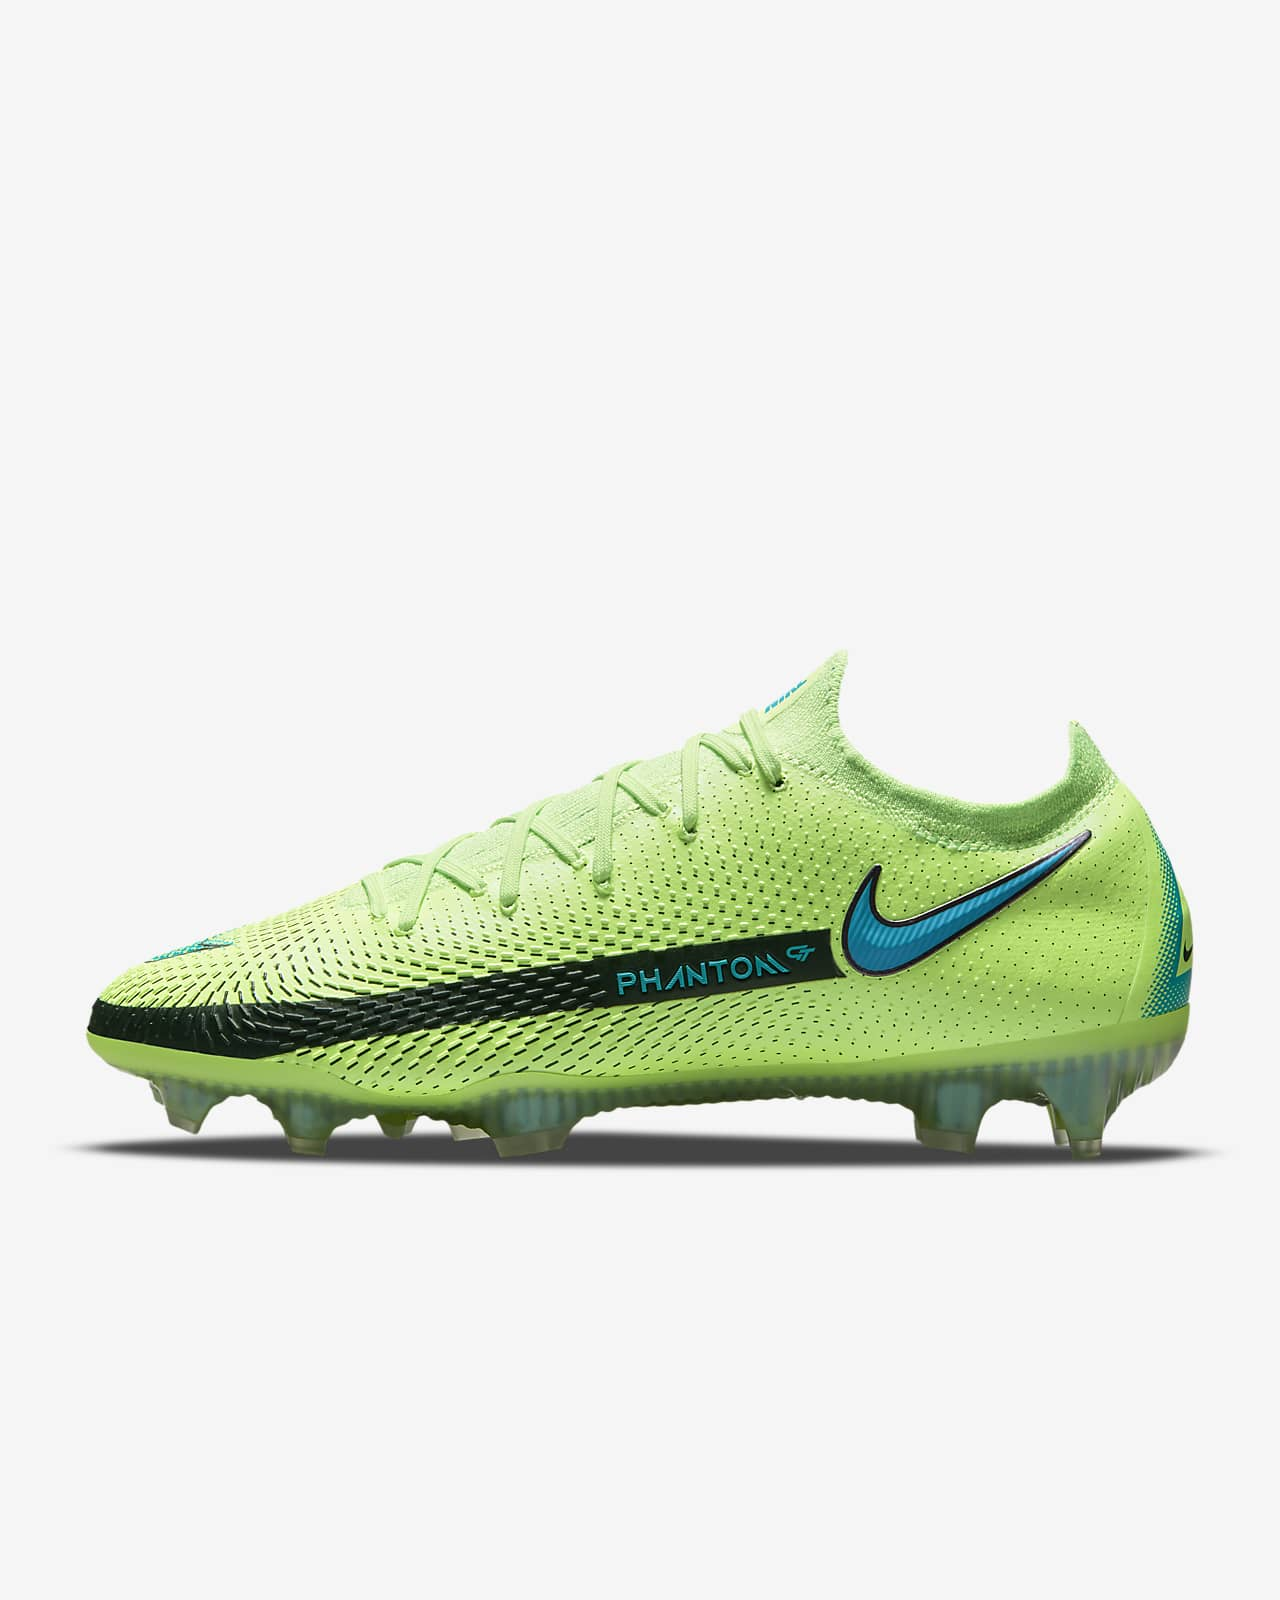 Nike Phantom GT Elite FG Firm-Ground Soccer Cleats